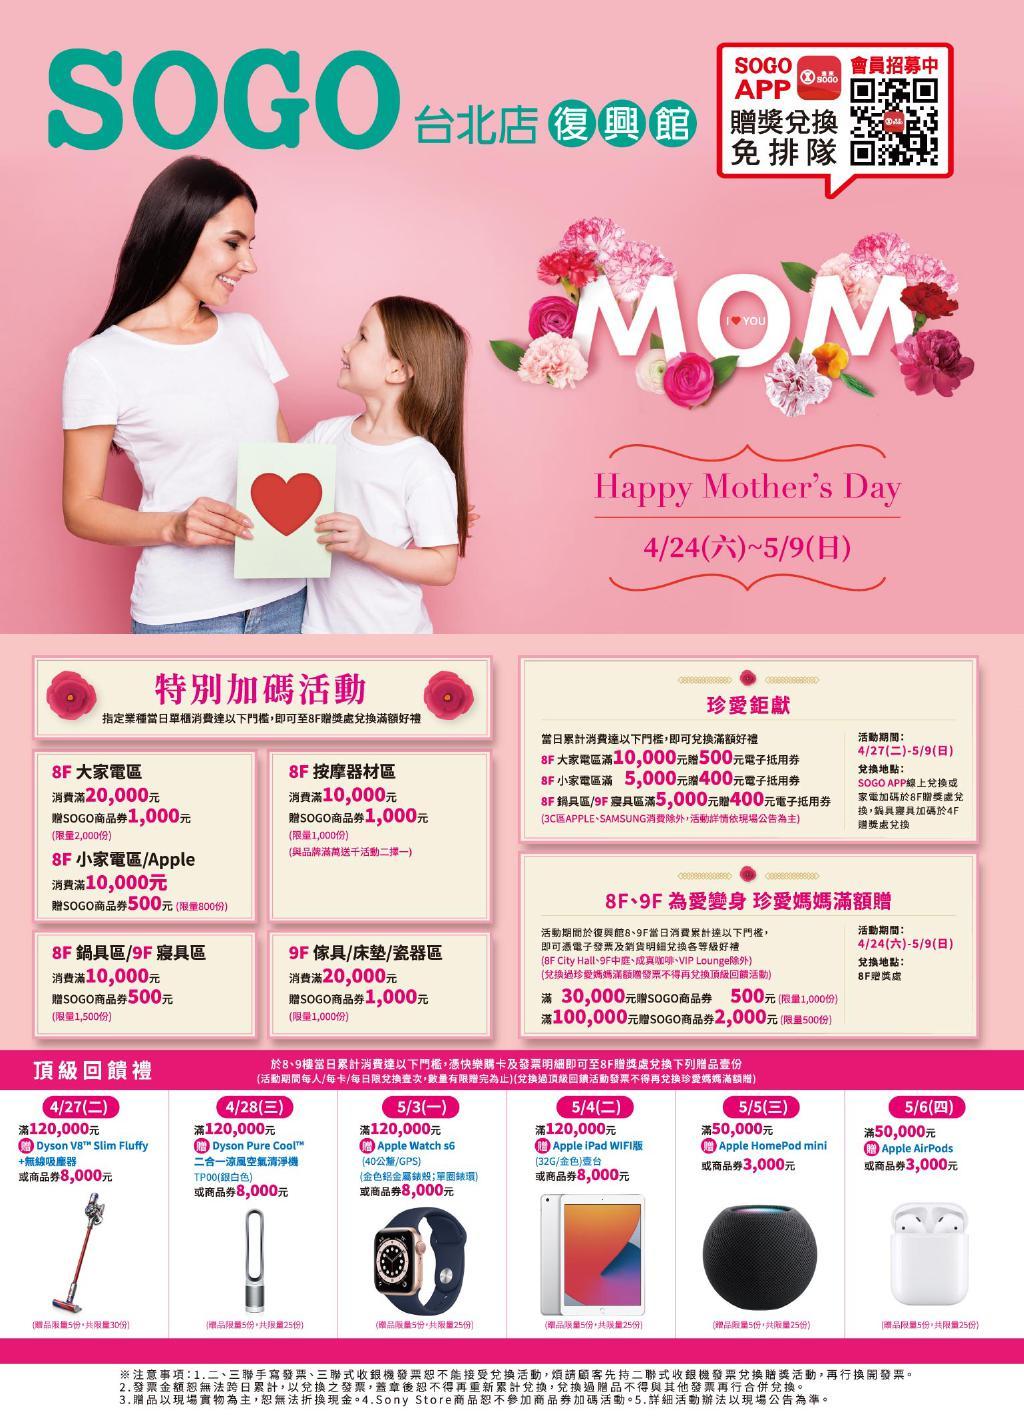 SOGO《台北復興館》「MOM,I LOVE YOU 母親節家電寢飾專刊」【2021/5/9 止】